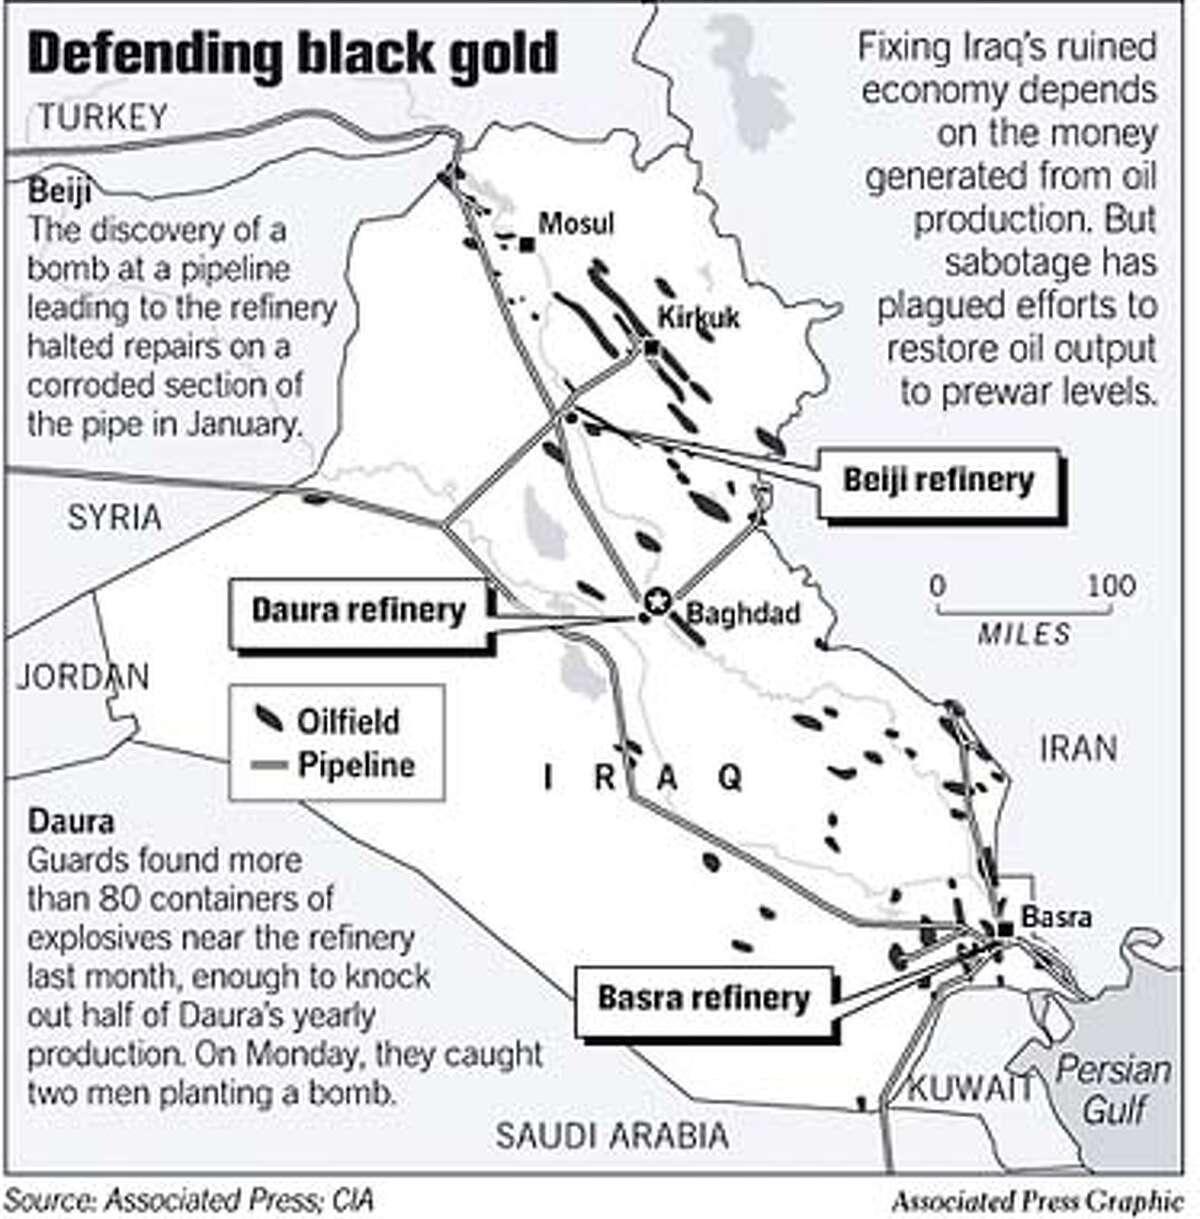 REBUILDING IRAQ / Workers get oil to near prewar